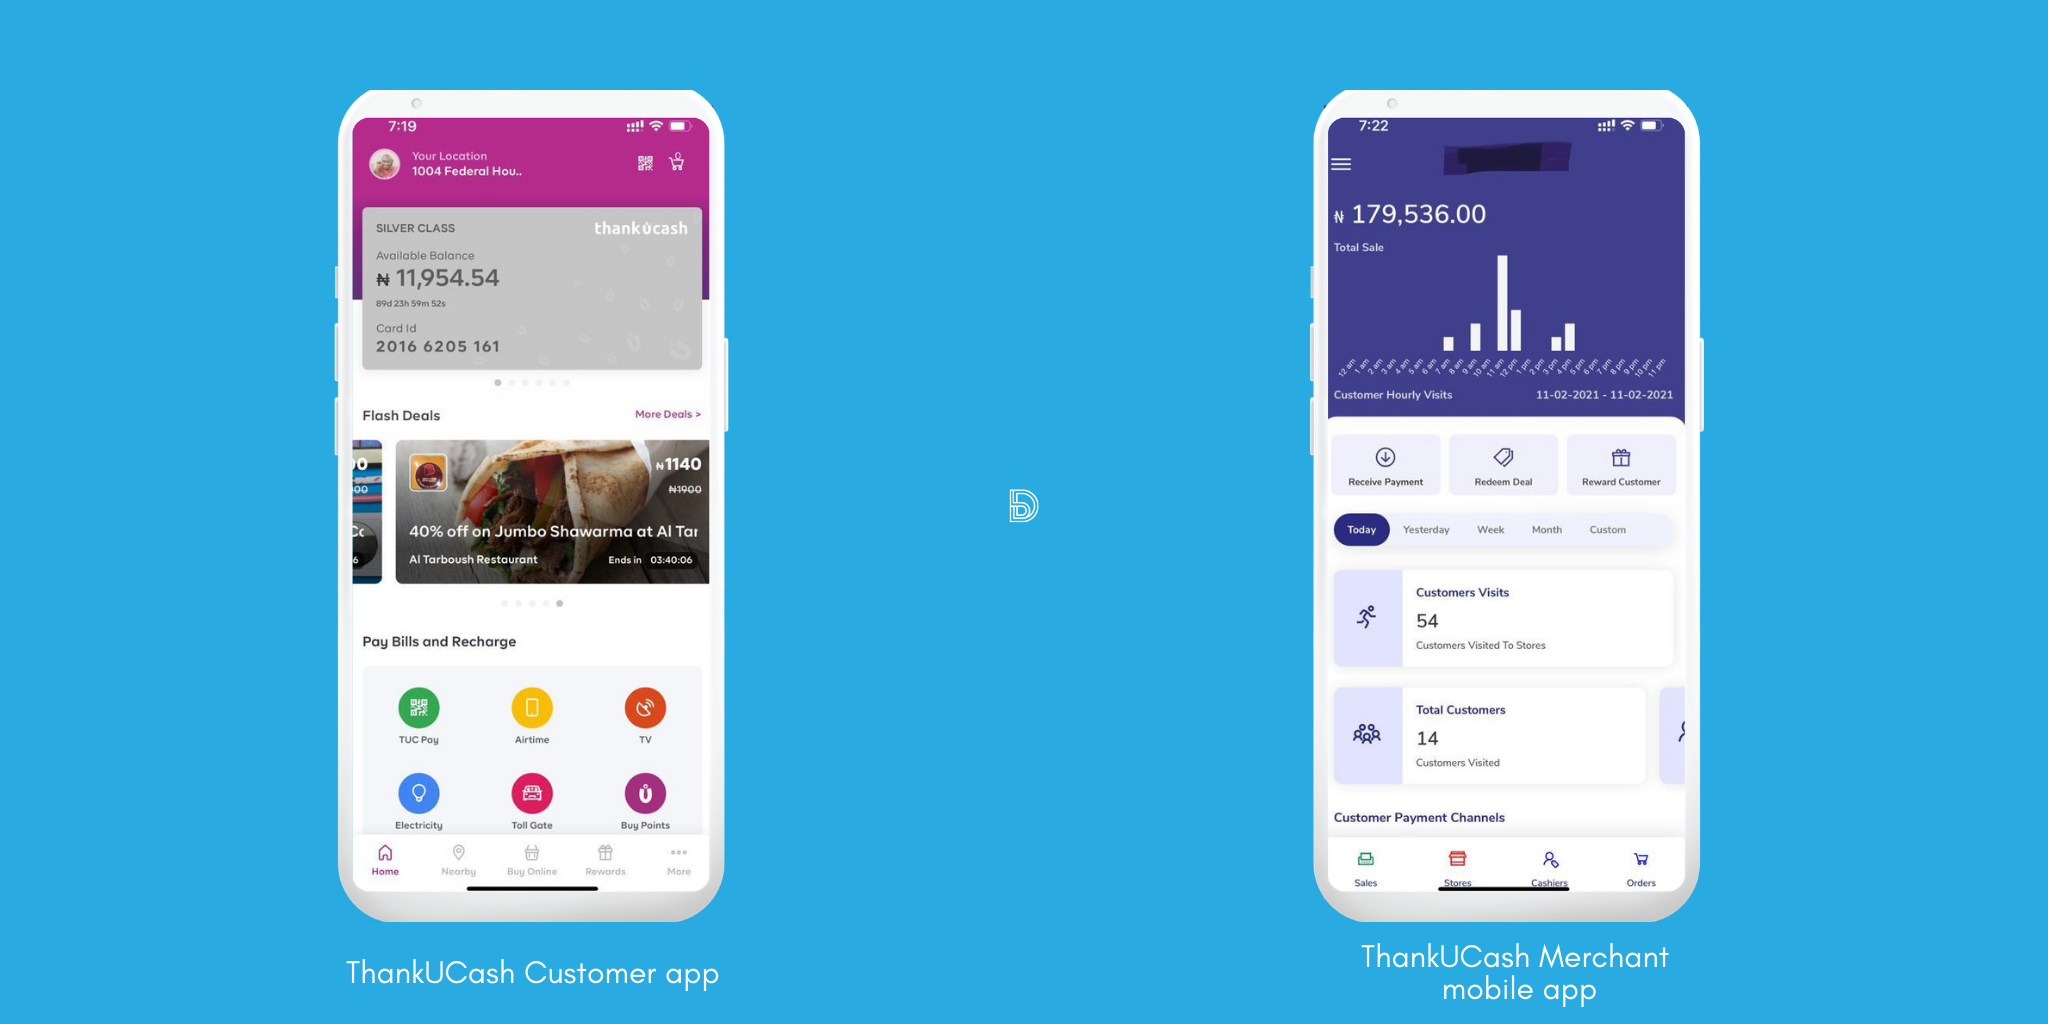 ThankUCash Customer and Merchant Mobile app